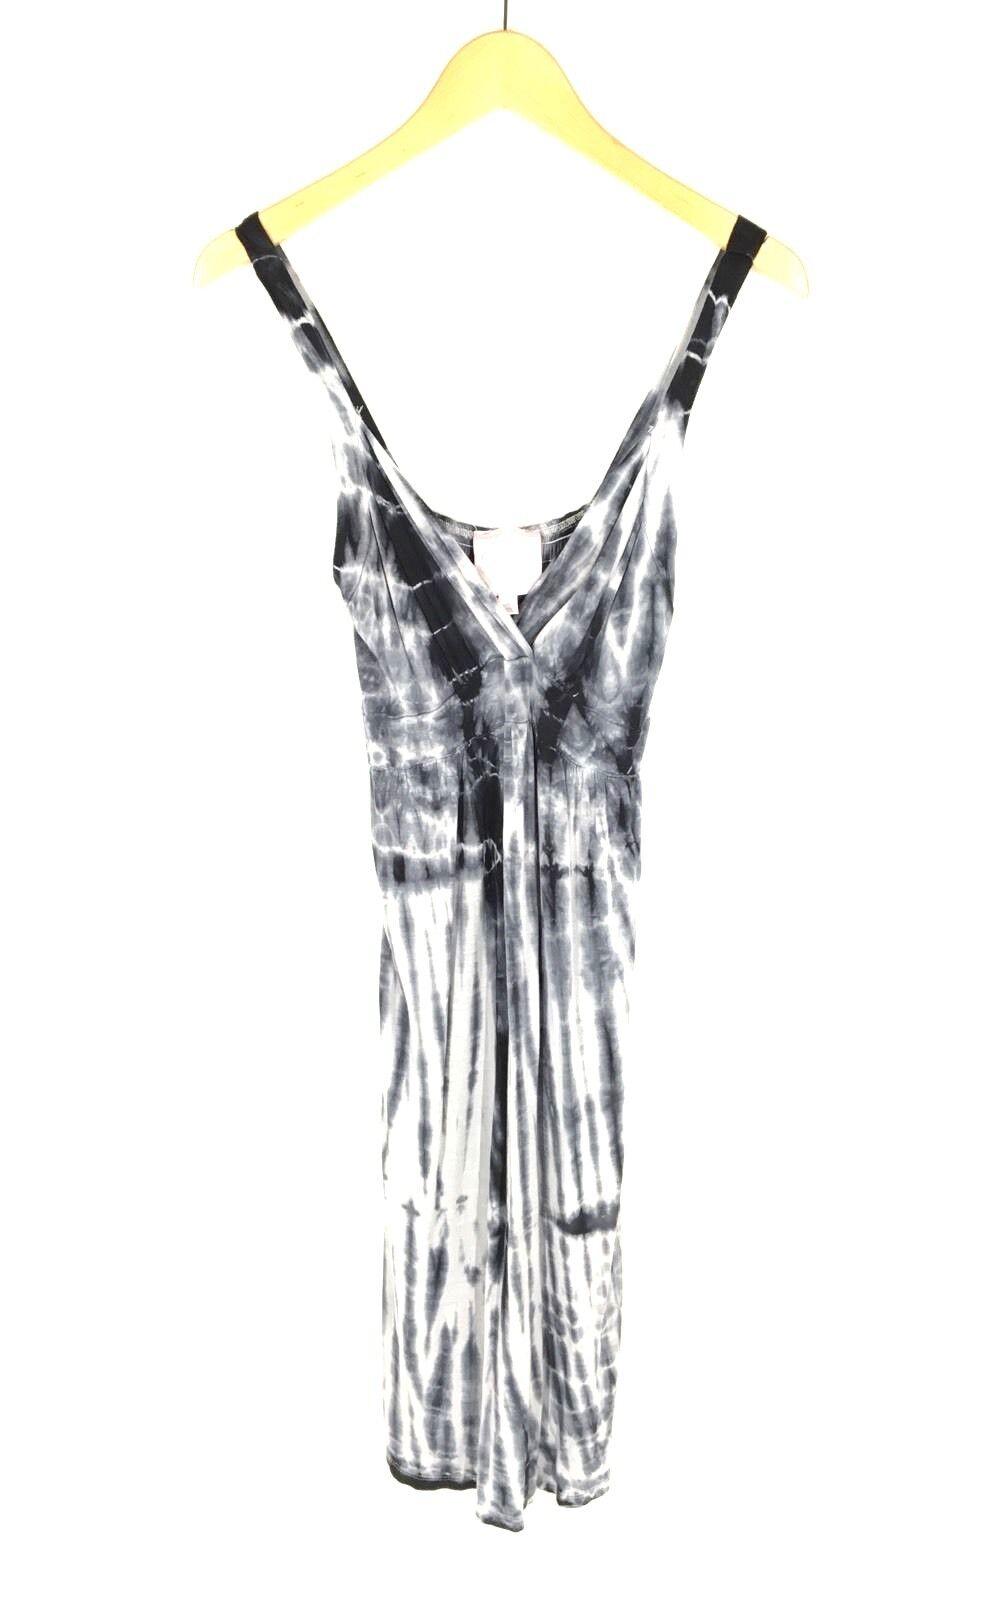 Romeo and Juliet Small schwarz & Weiß Tie Dye Dress